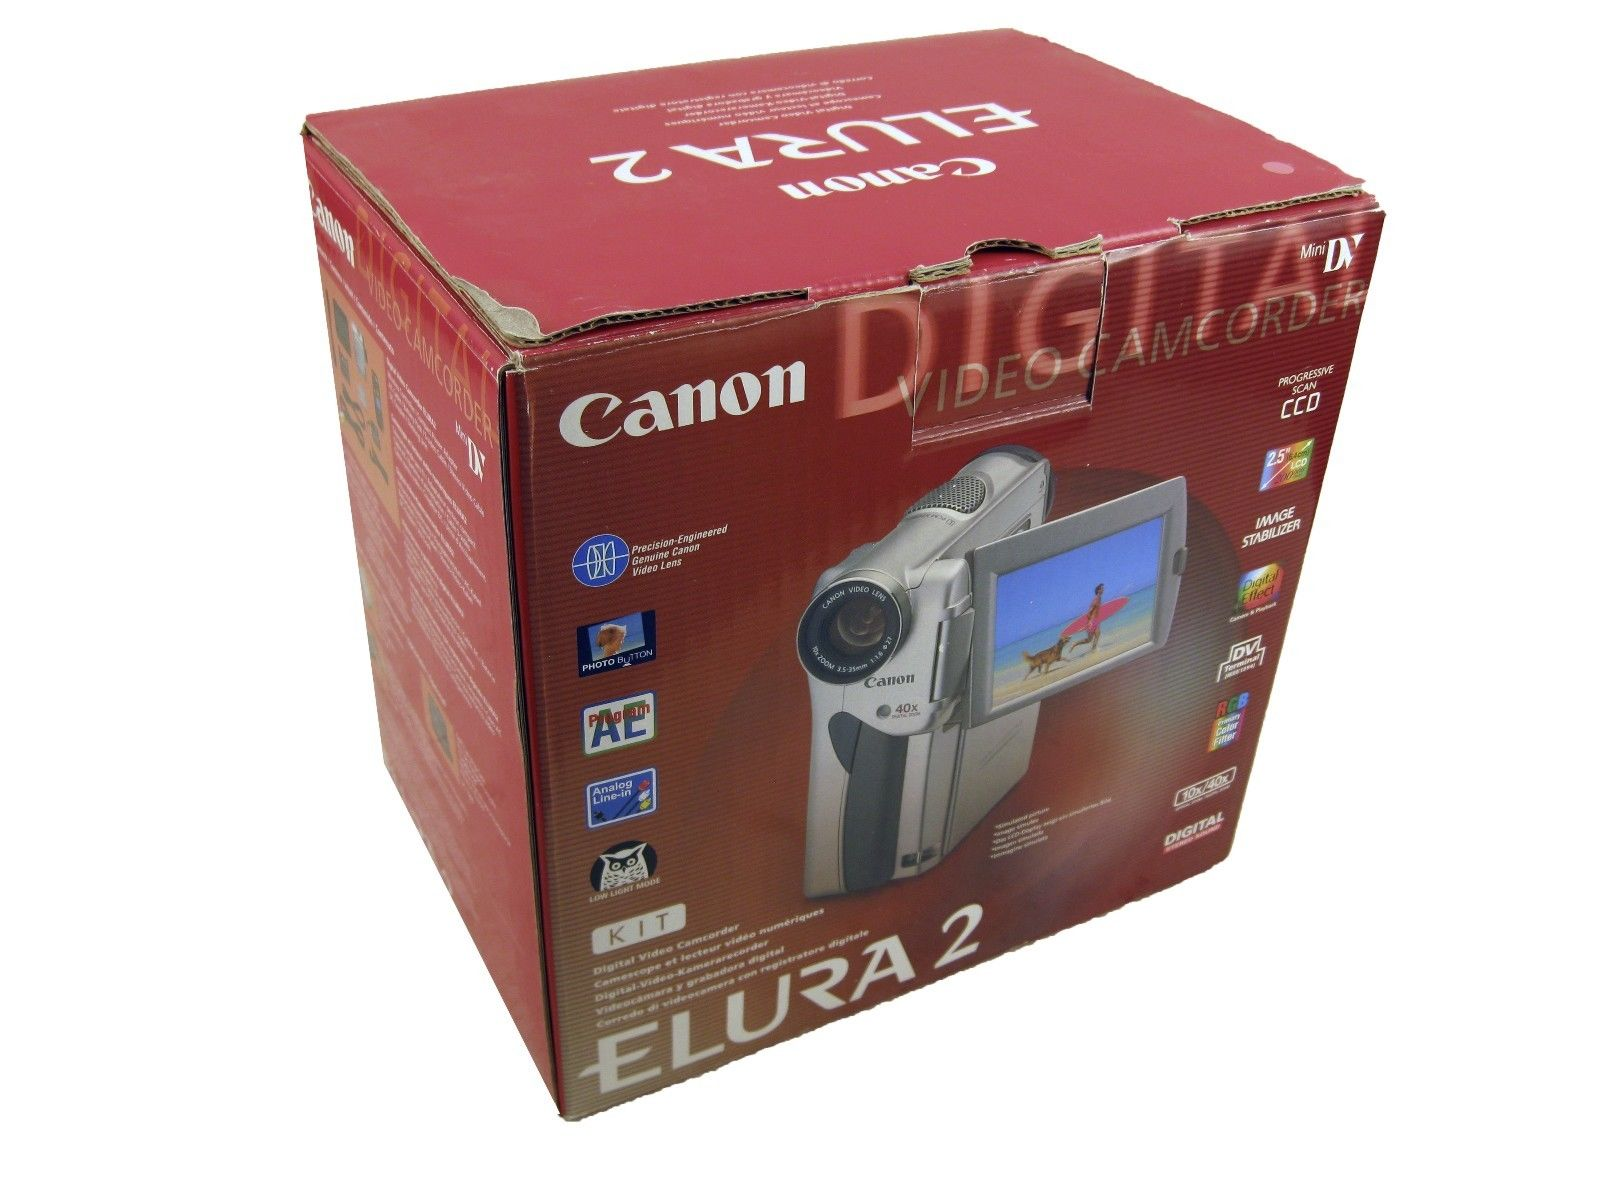 Canon Elura2 Mini DV Camcorder 10x Optical Color Viewfinder 40x Digital Kit